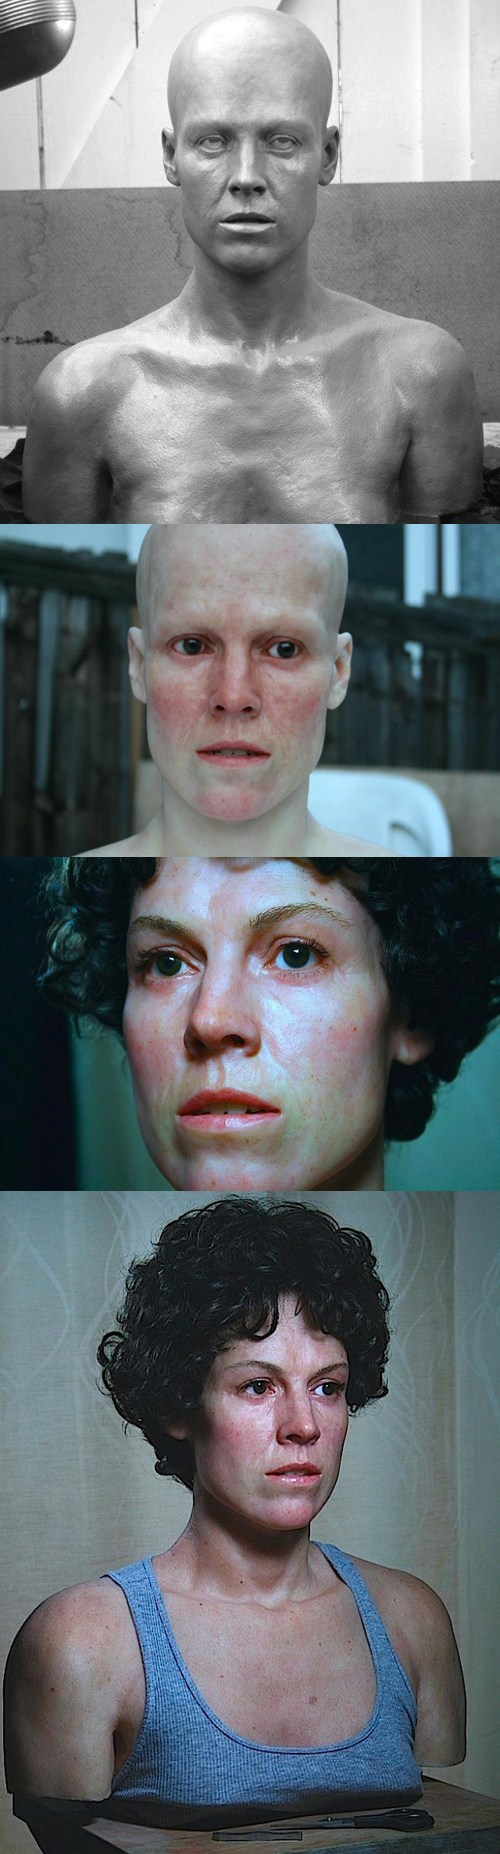 sigourney weaver statue Ellen Ripley bust Aliens realistic uncanny valley - 6699362816